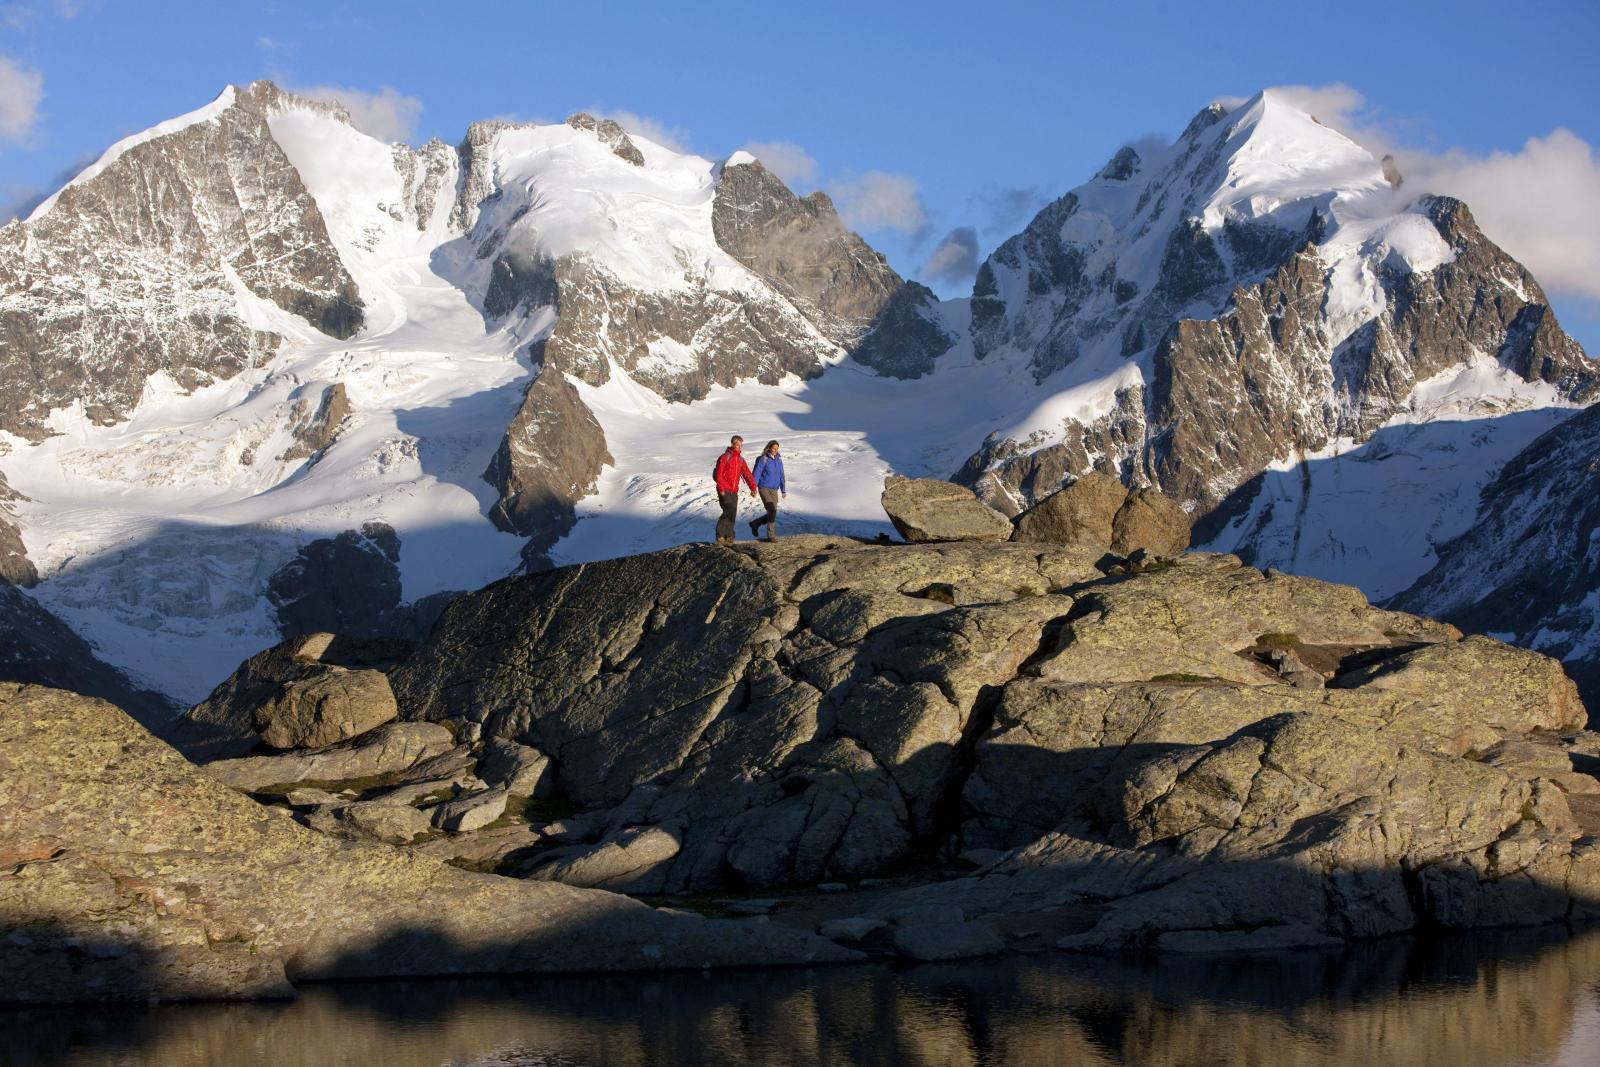 Hiking through the Swiss Alps